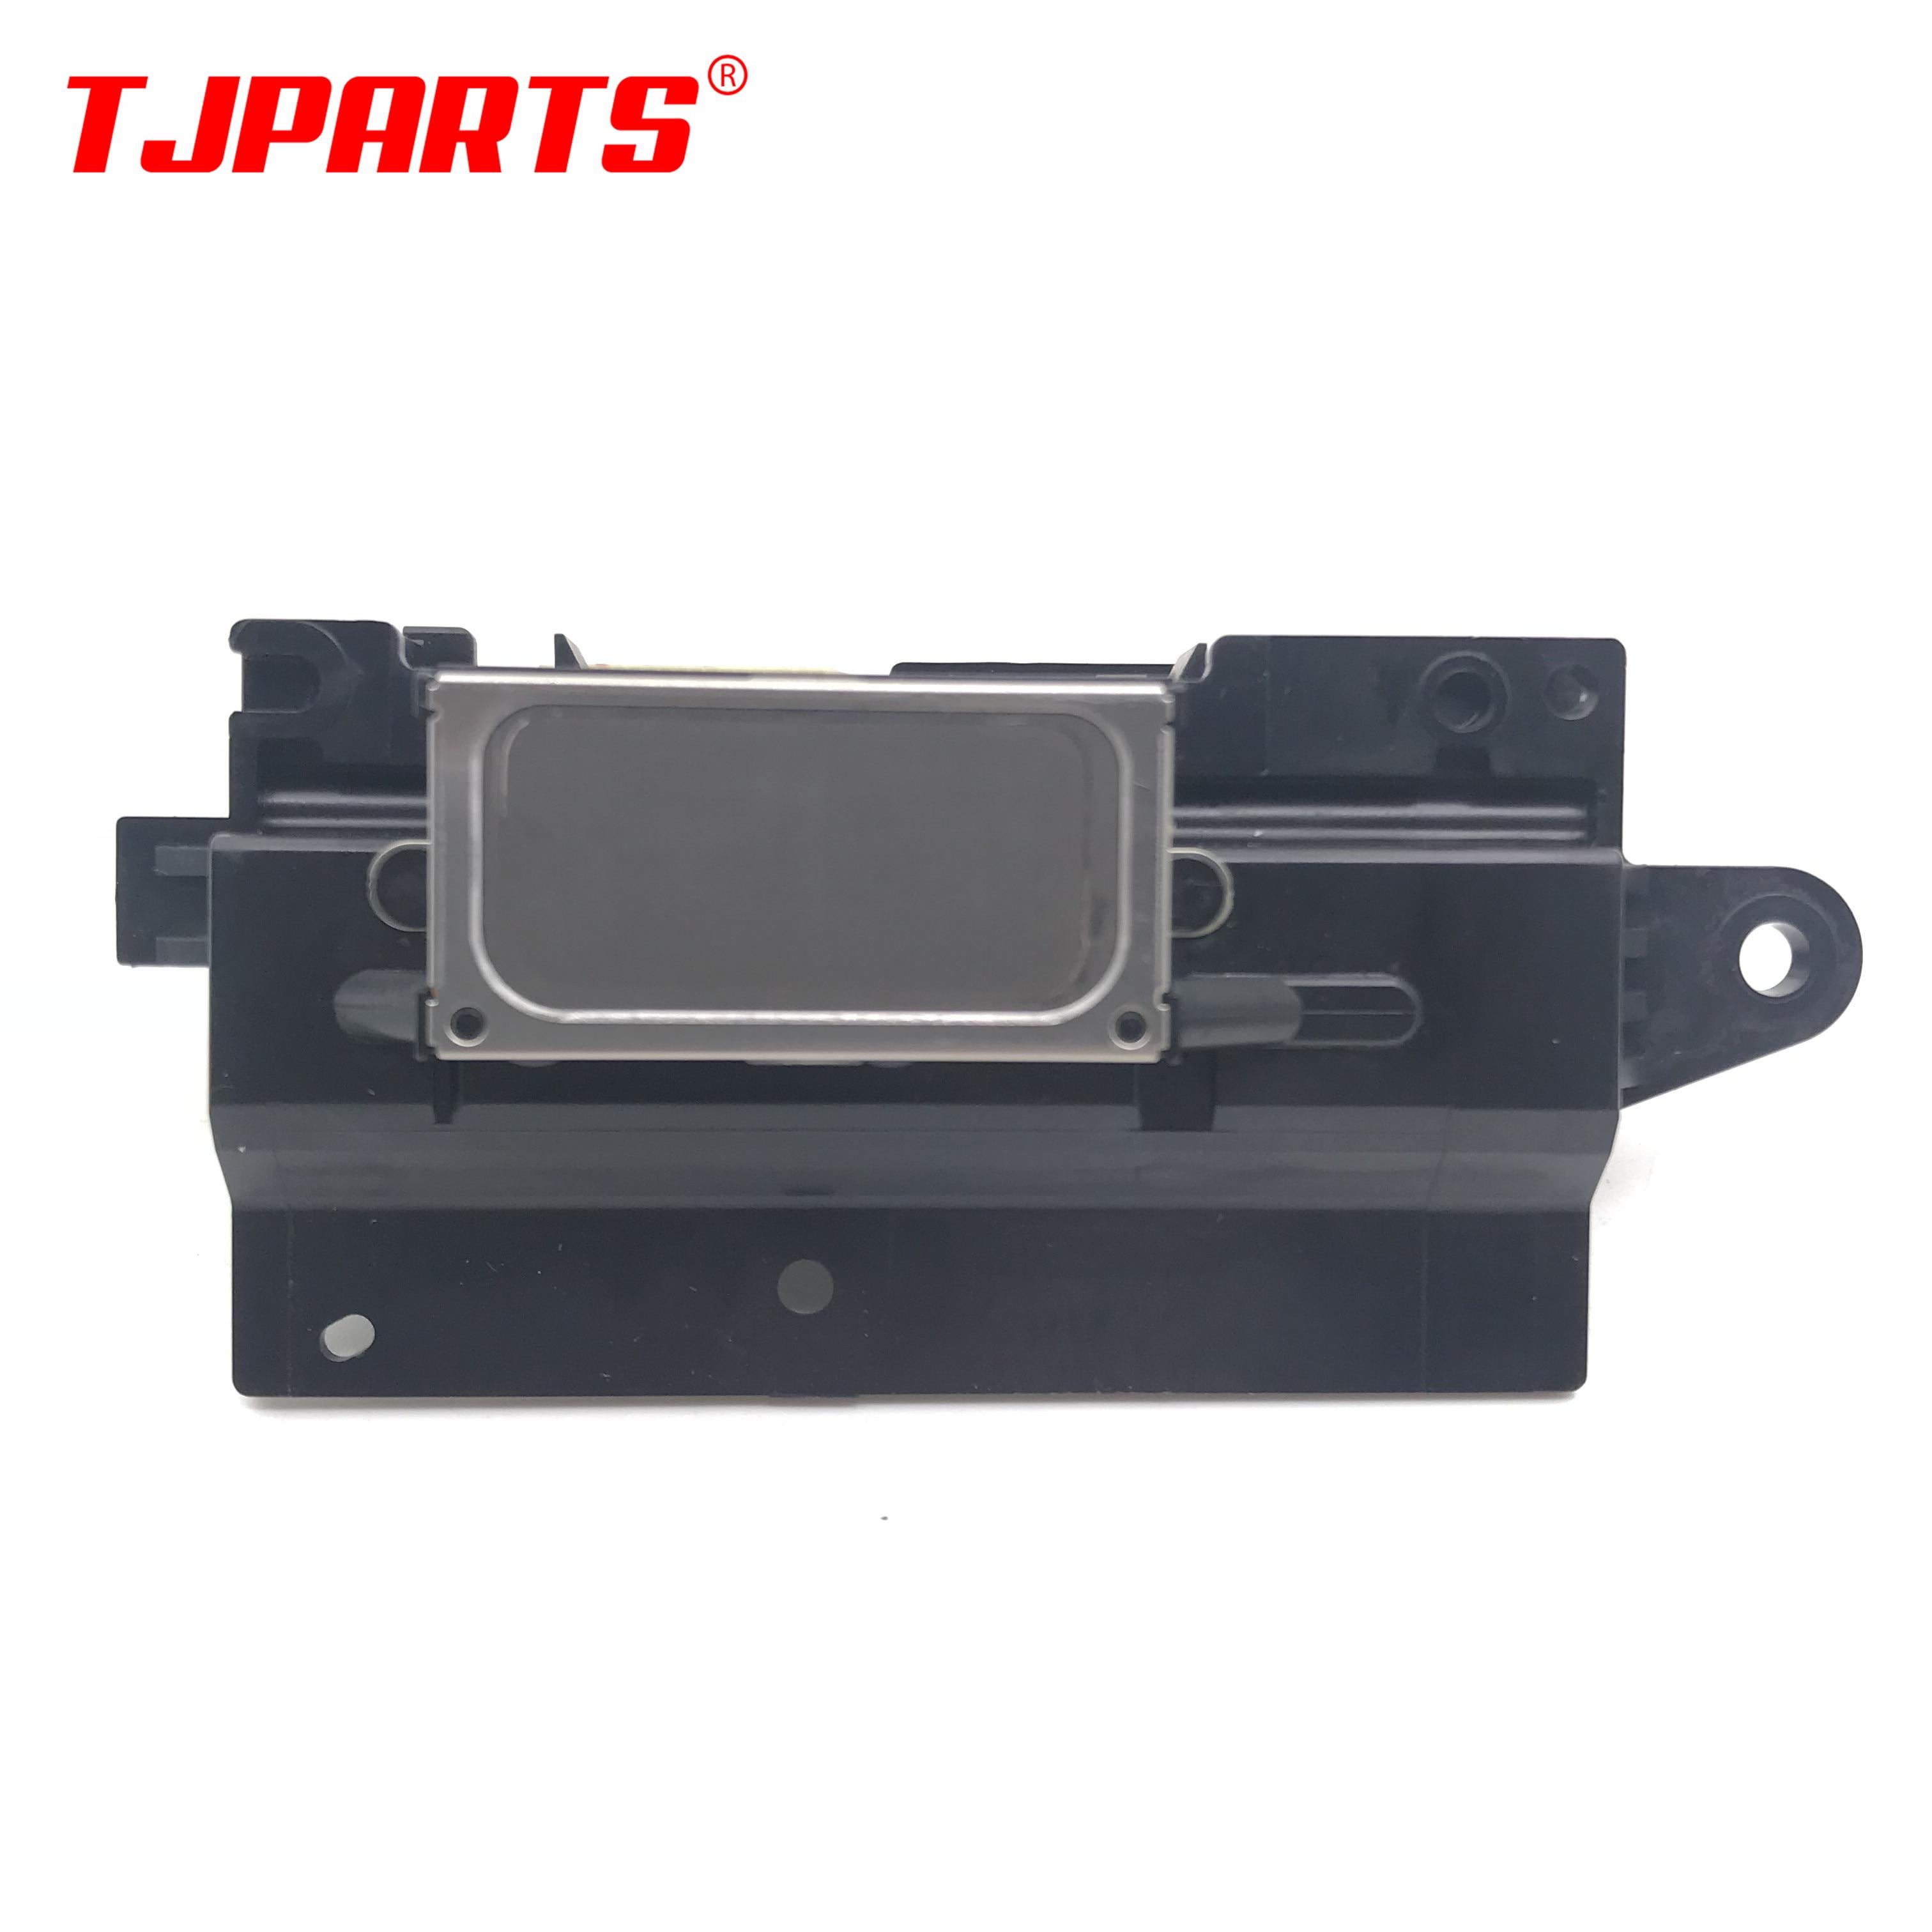 F083000 F083030 Printhead Printer Print Head for Epson Stylus  Photo 790 890 895 1290 1290S 915 900 880Printer Parts